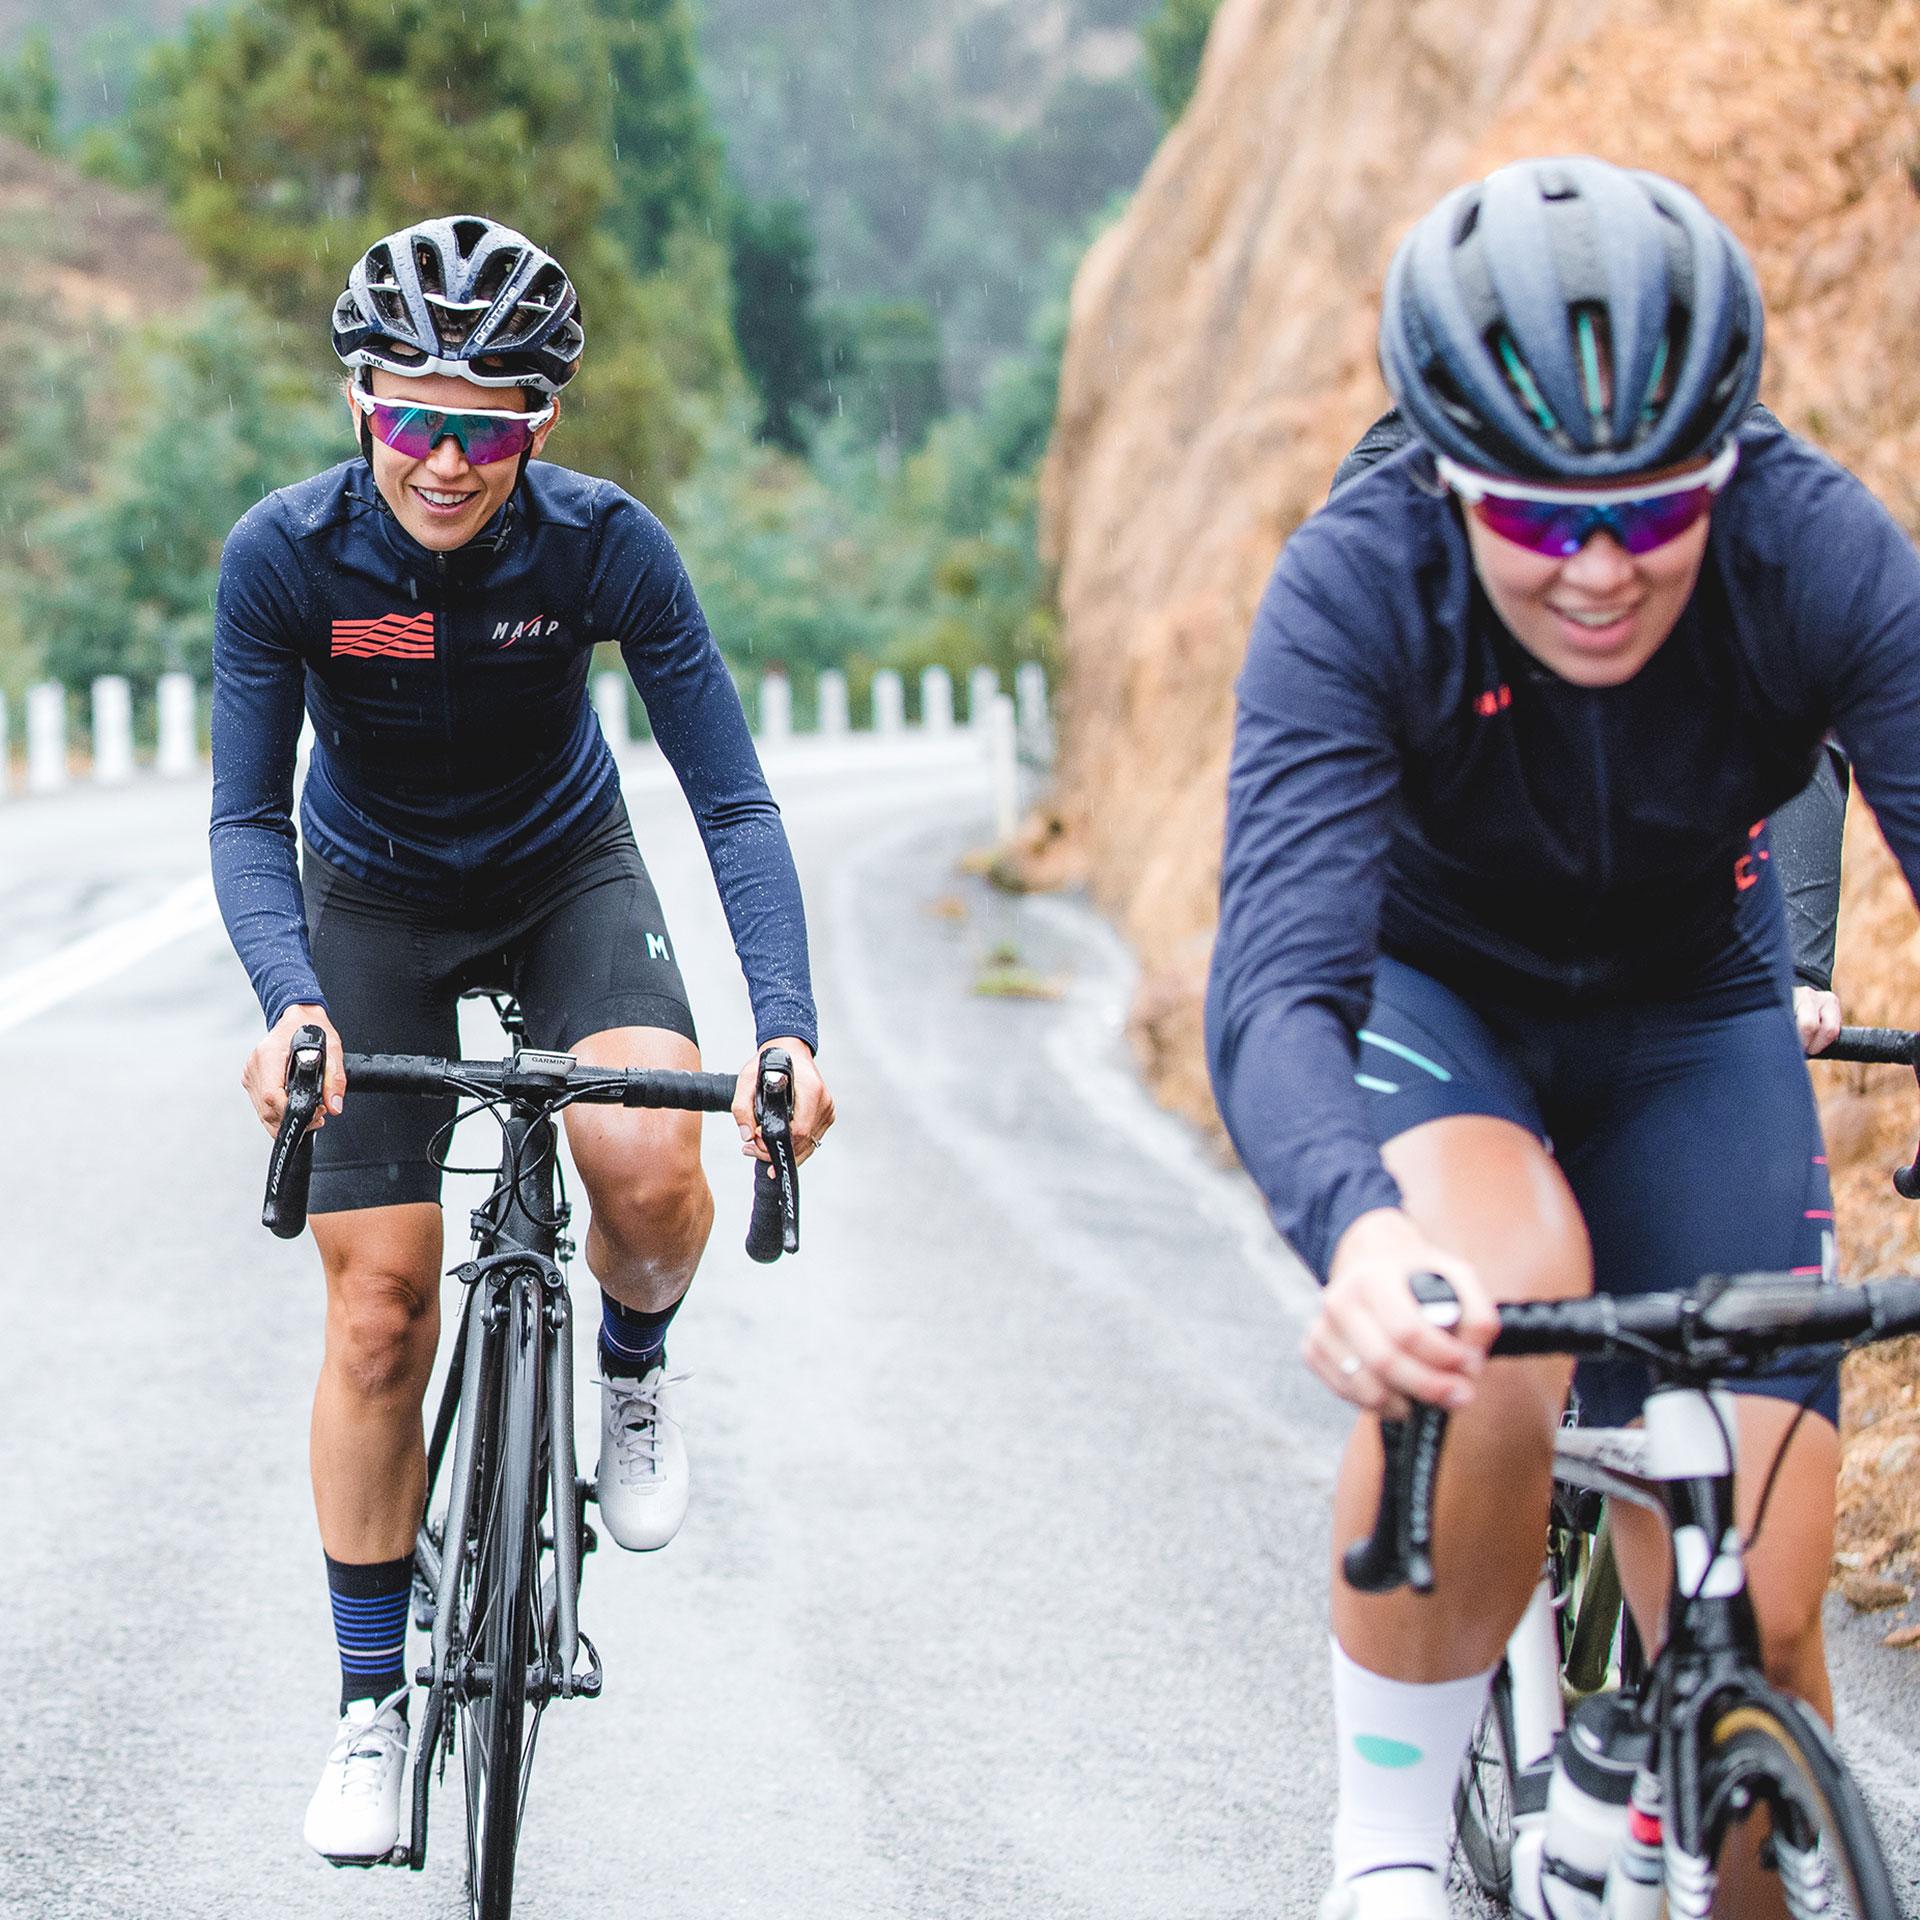 MAAP Cyclists Climbing